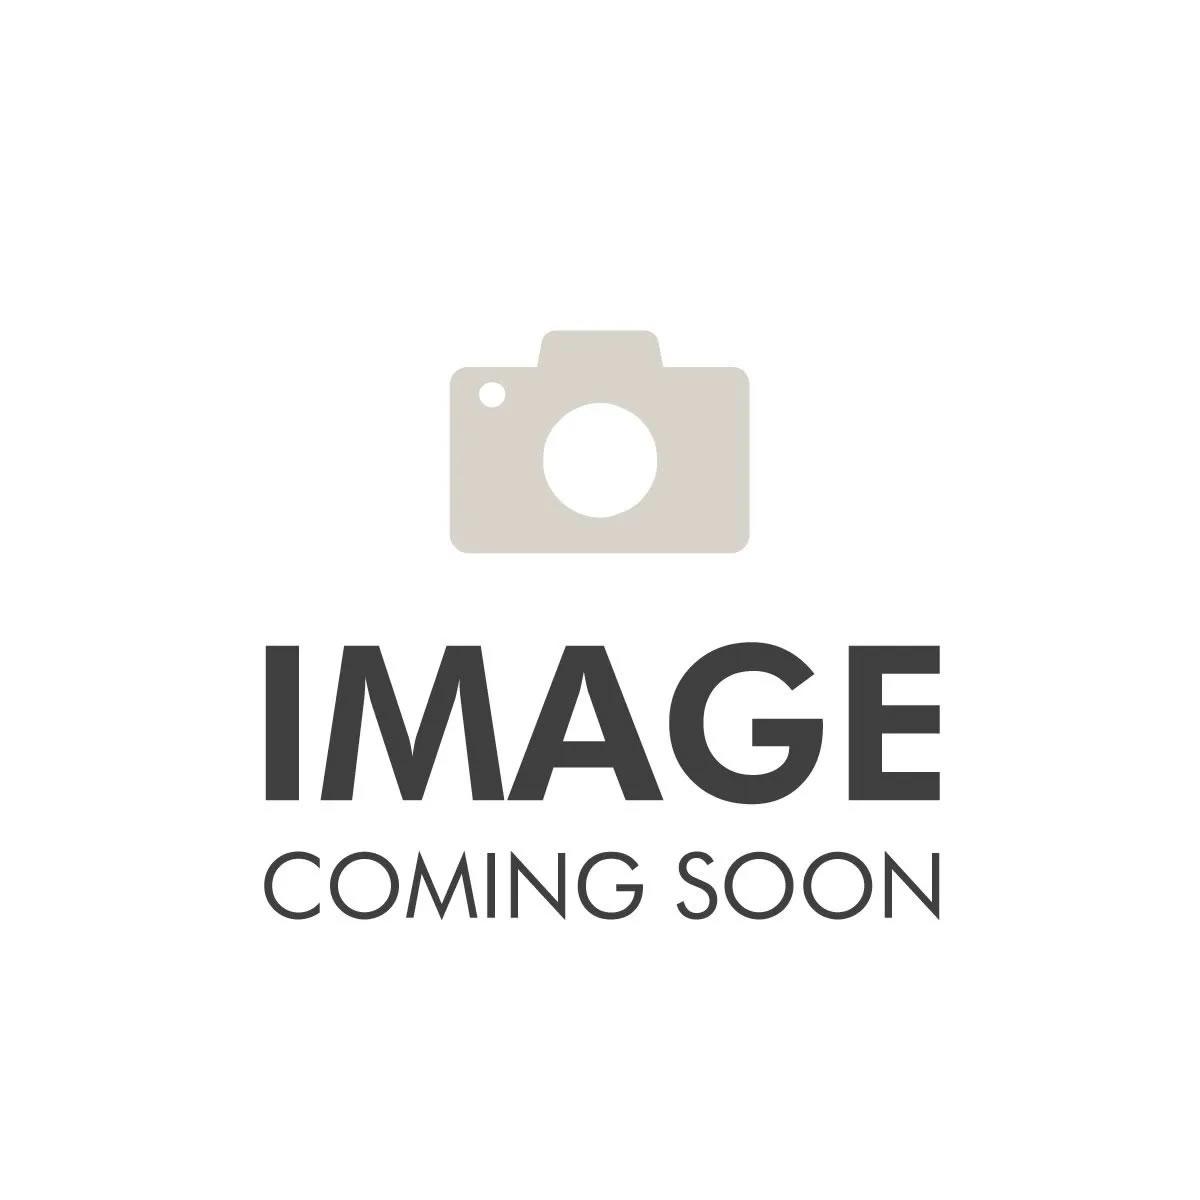 Ignition Tune Up Kit, 42L; 87-90 Jeep Wrangler YJ